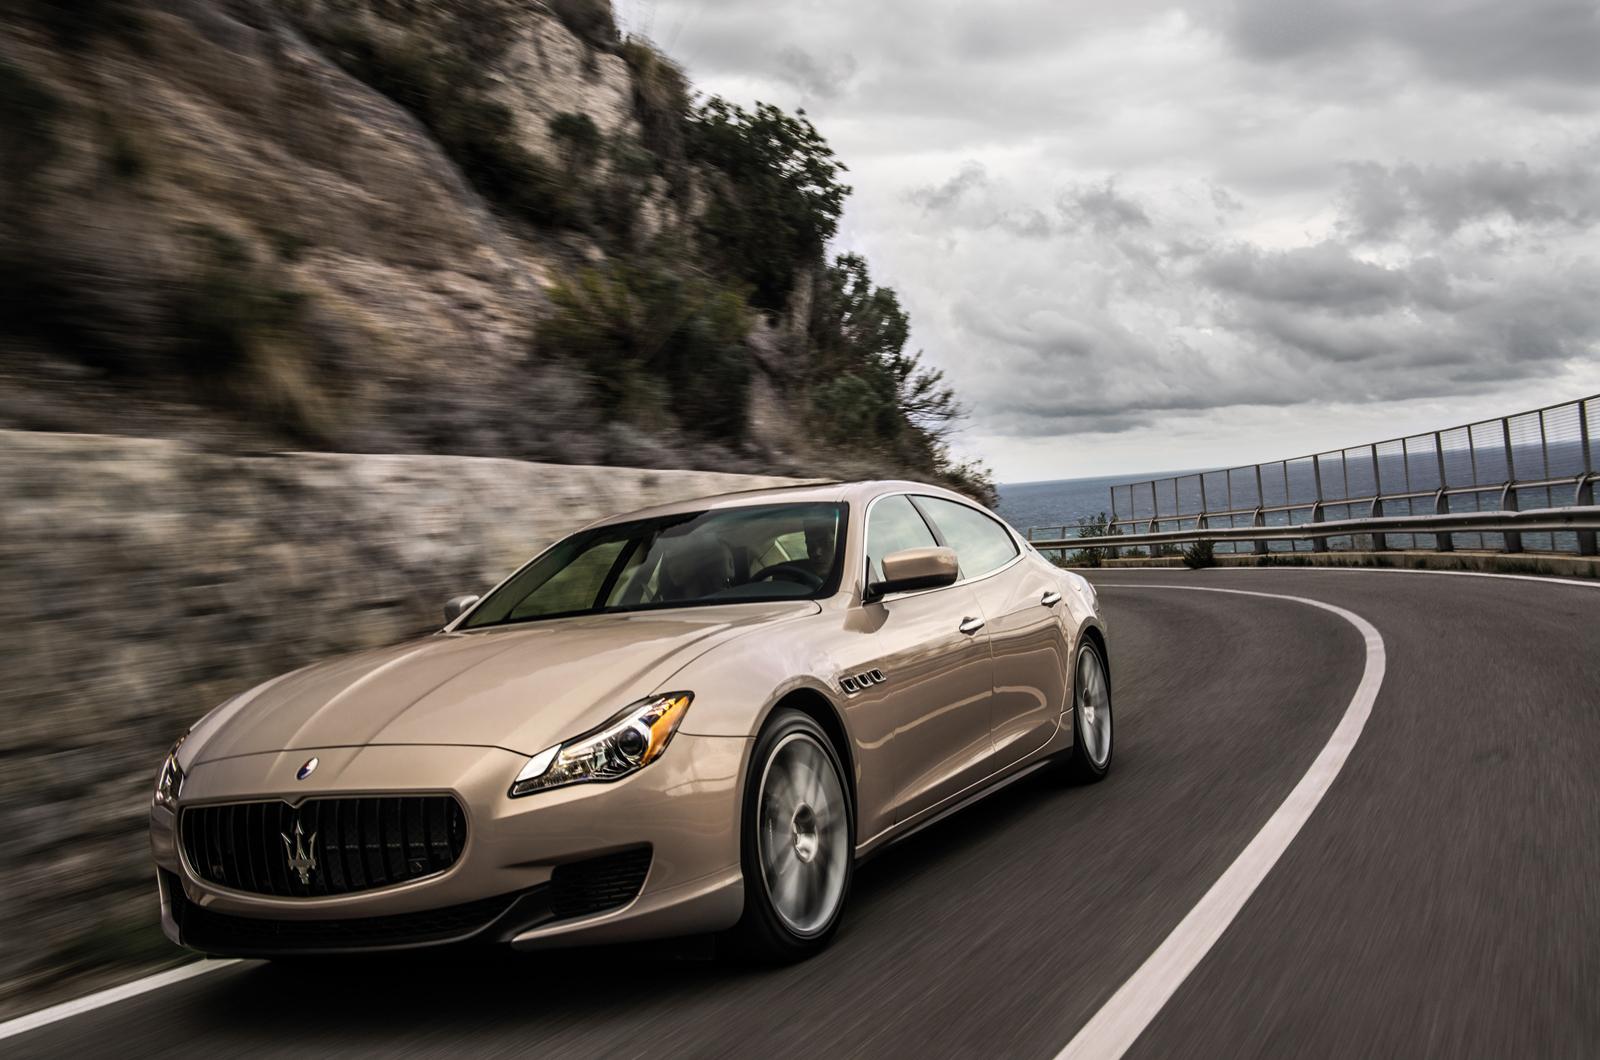 First Drive Review: 2013 Maserati Quattroporte V8 Review